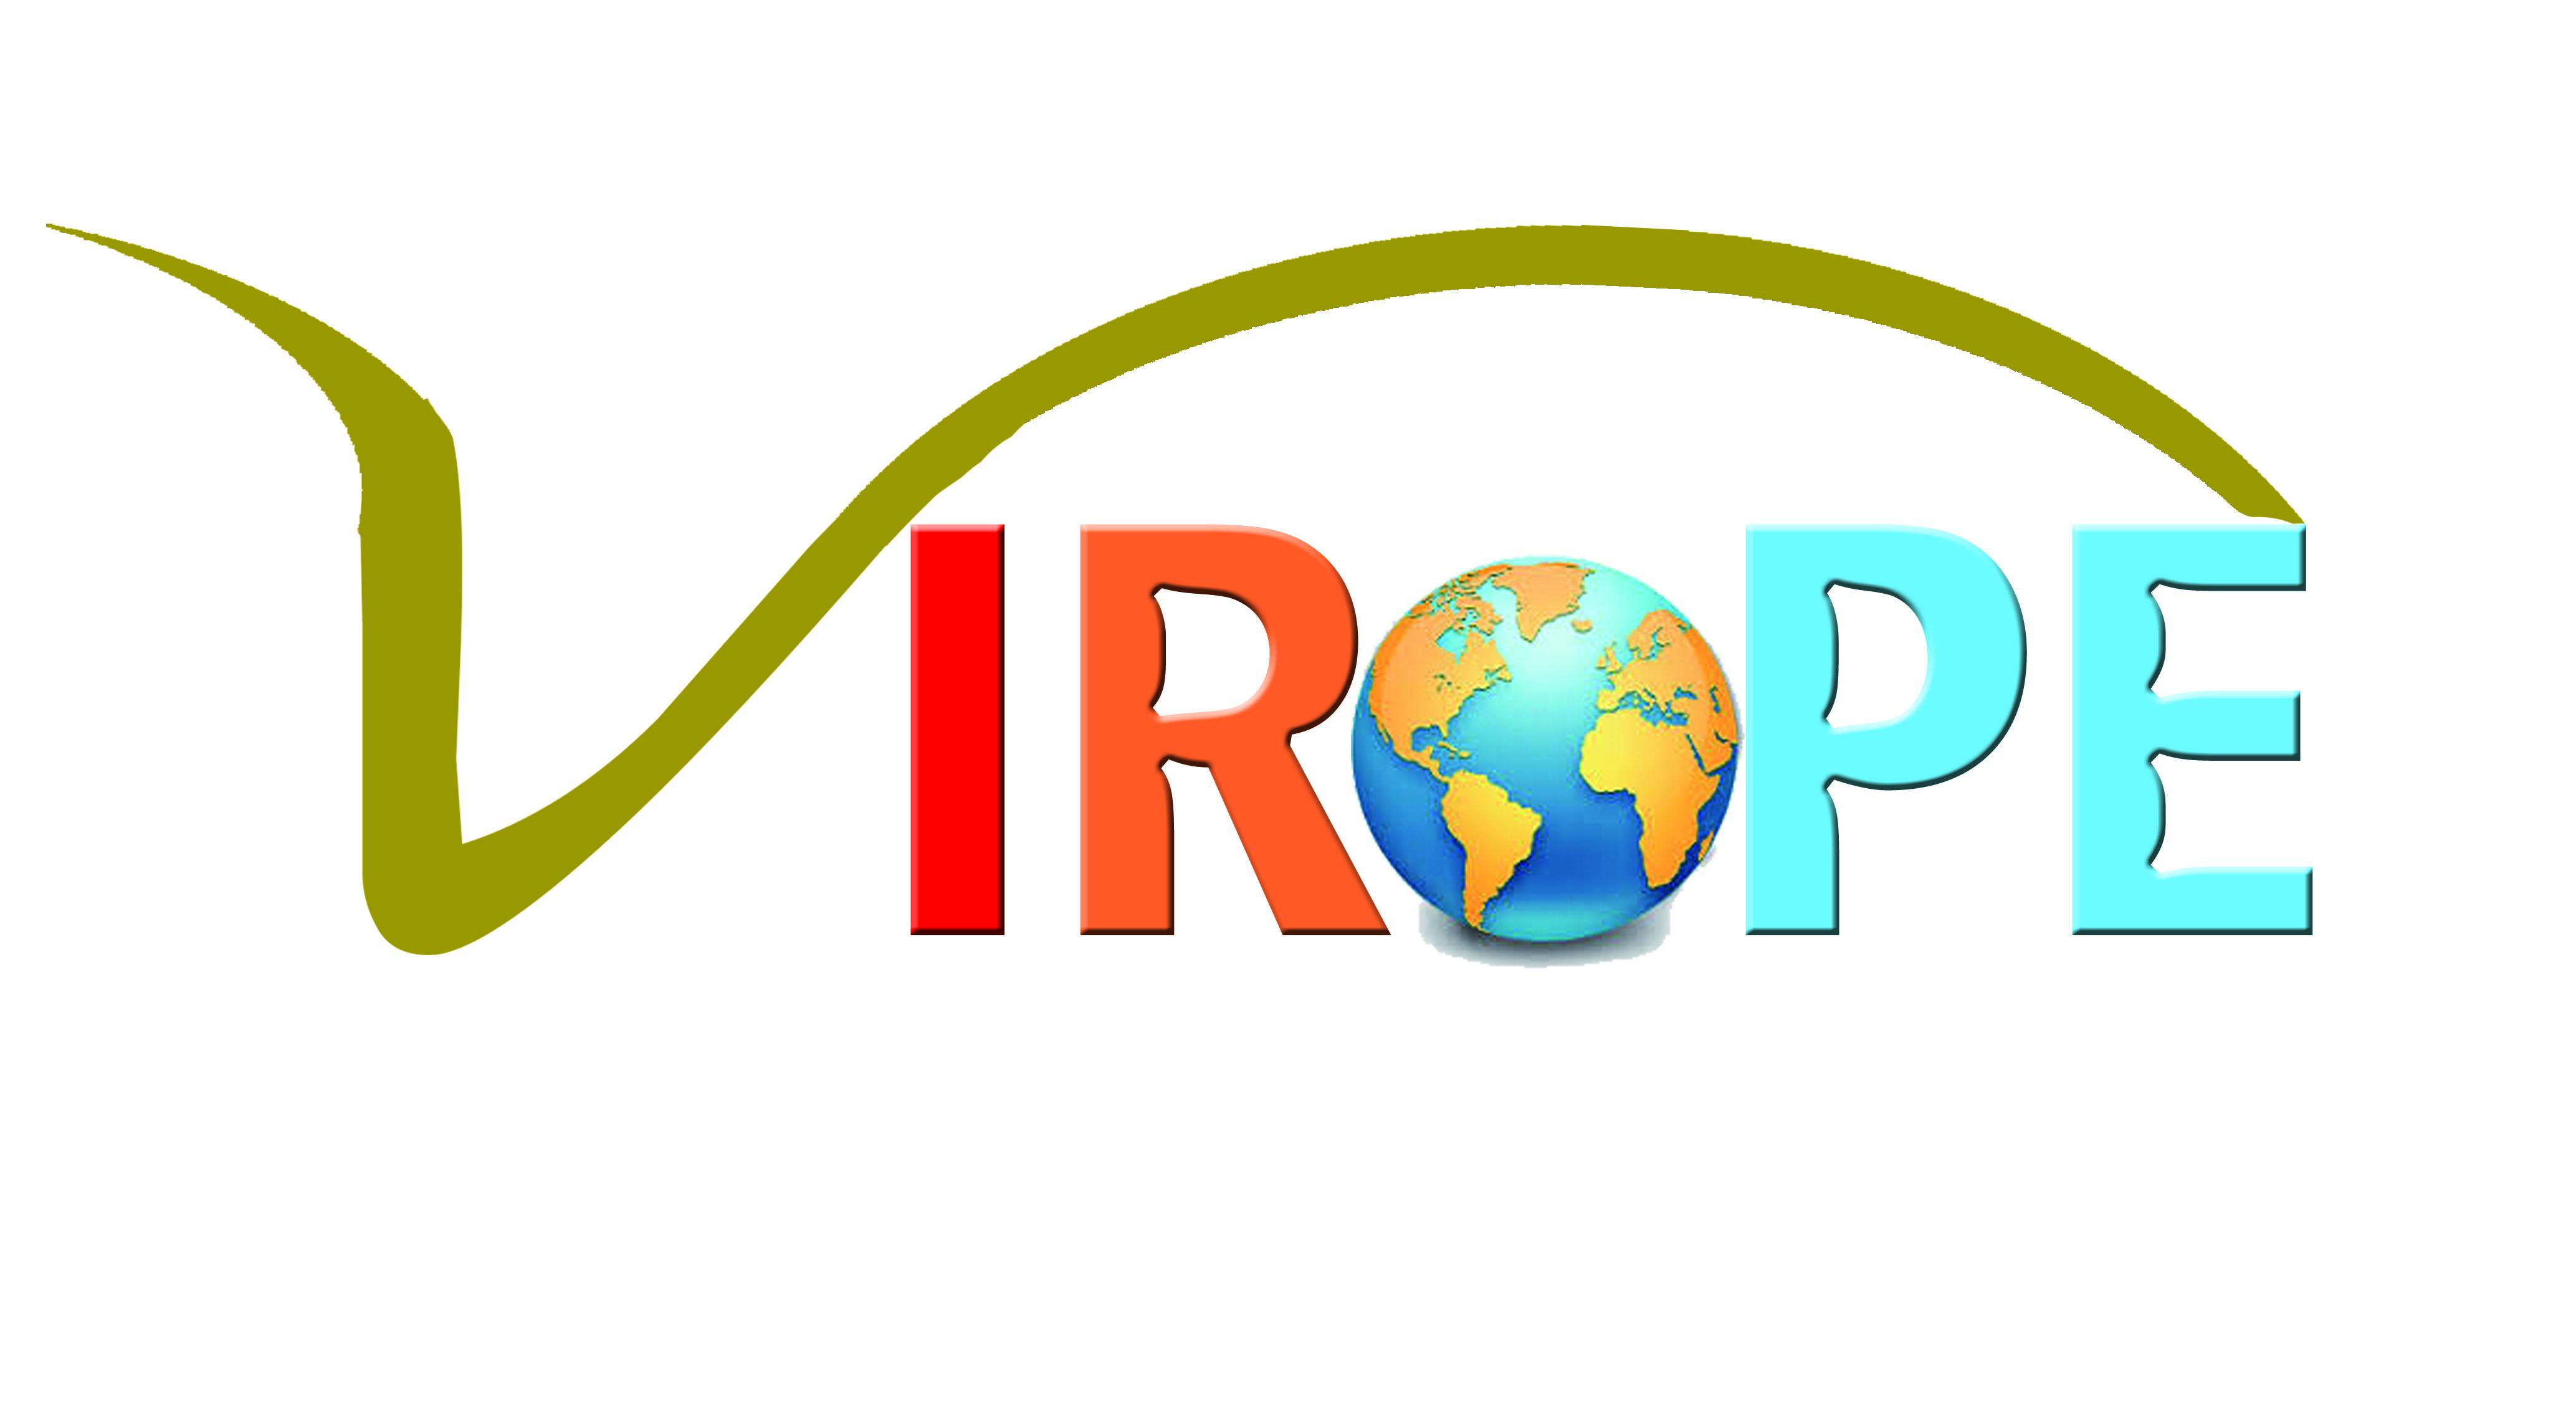 Offres de Bourse Viropé au Cameroun